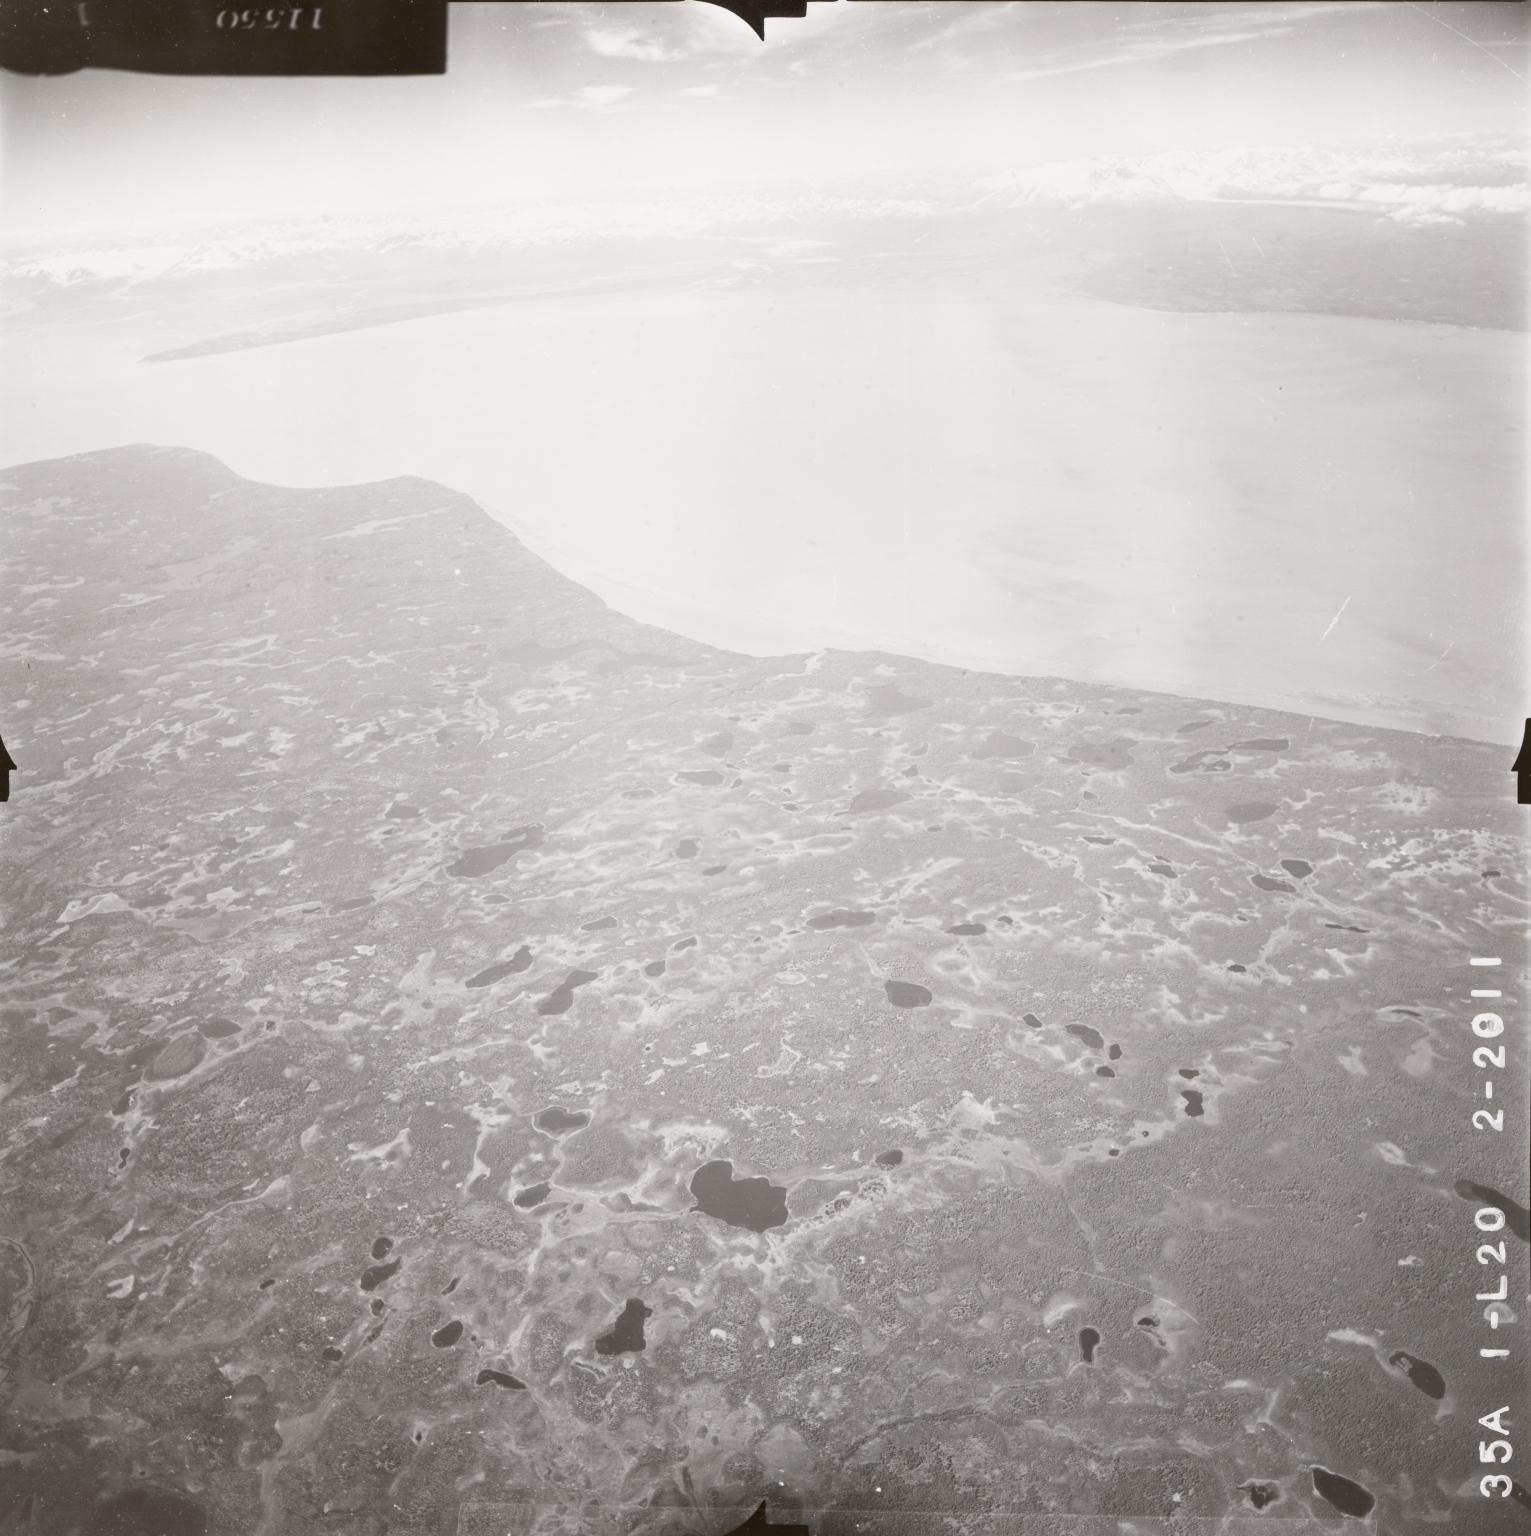 No glacier near Mount Spurr, aerial photograph FL64, Alaska, United States